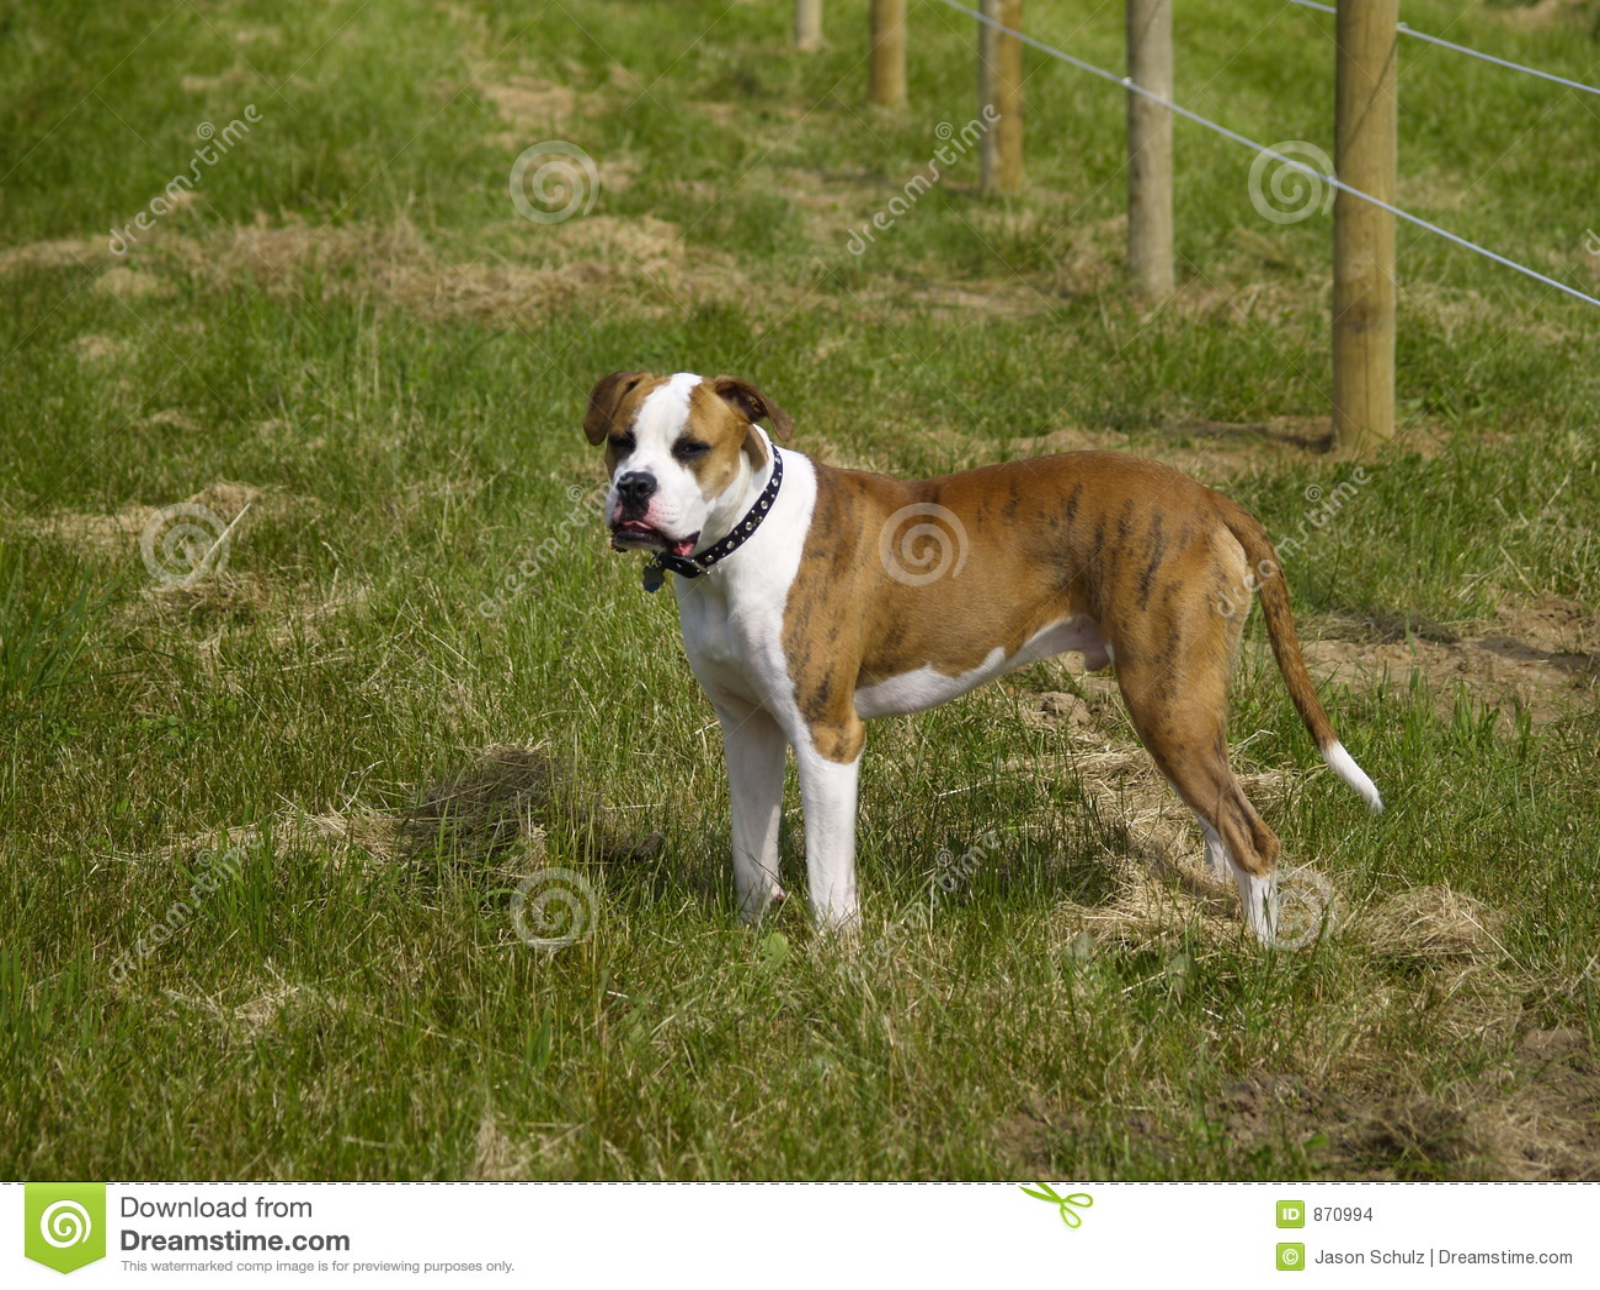 bulldogge amerikanische